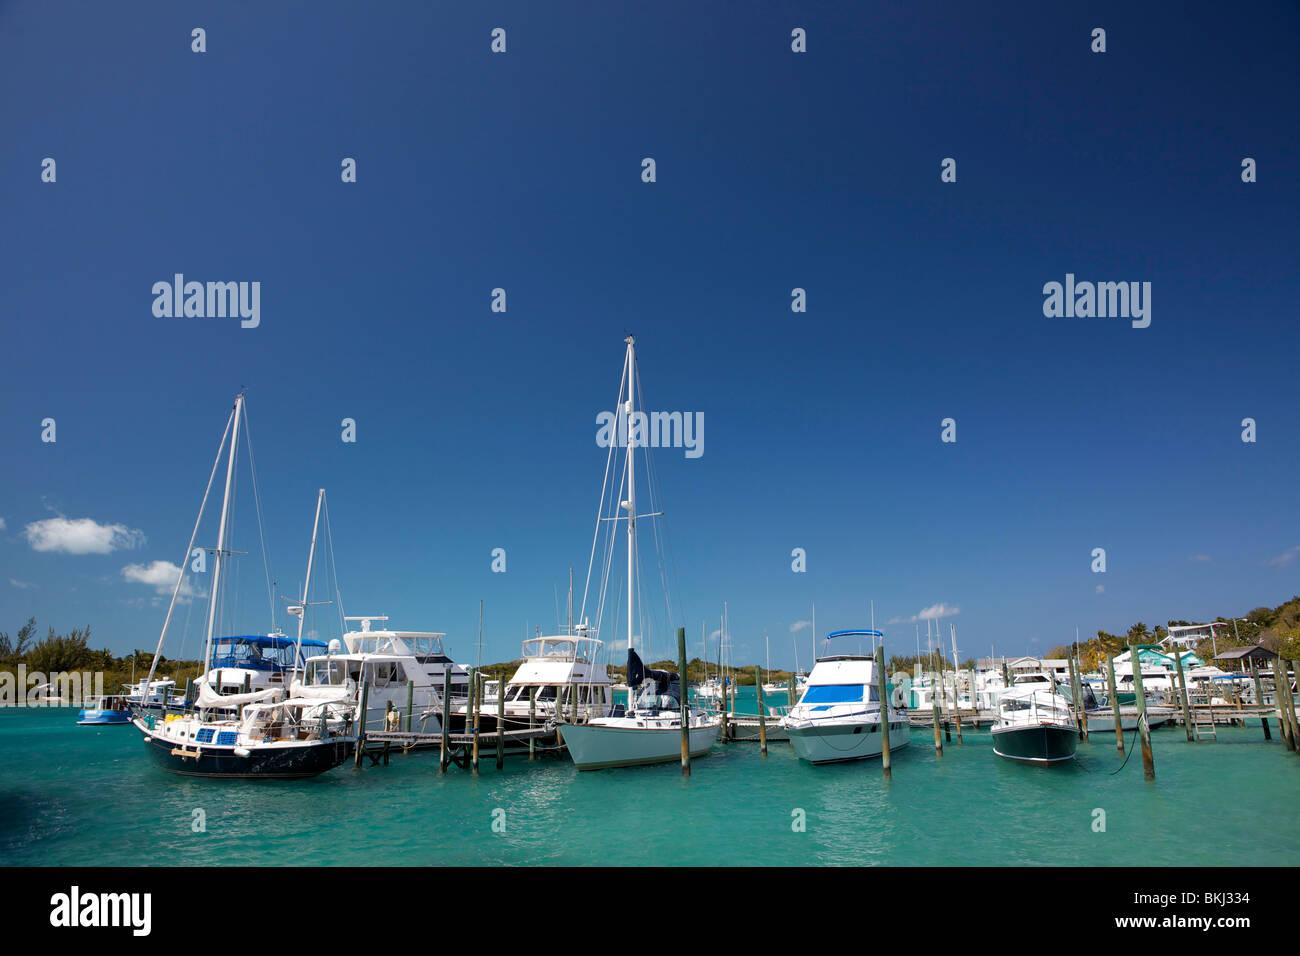 Sailboats and motor boats tied up in slips at the marina in Man O War Cay. - Stock Image